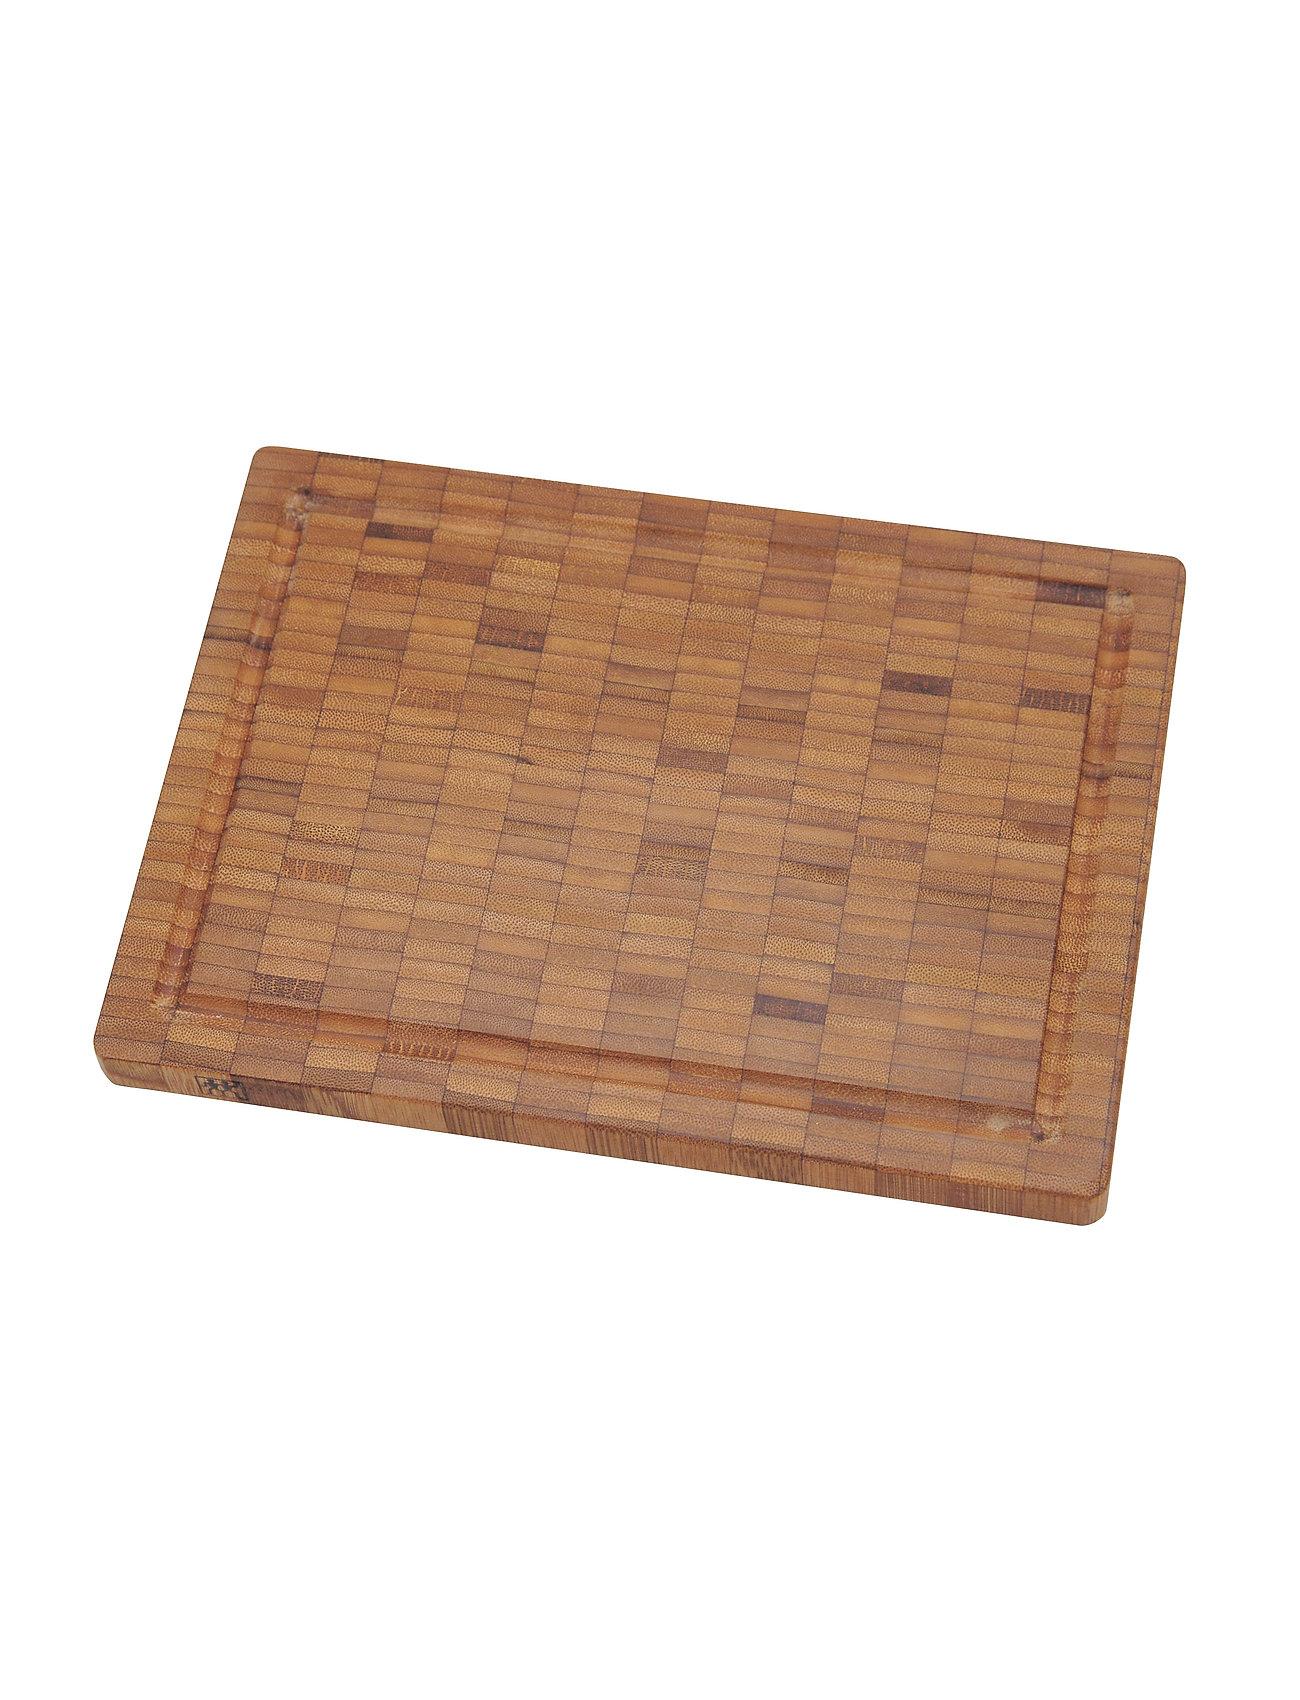 Cutting Board Home Kitchen Kitchen Utentils Cutting Boards Brun Zwilling